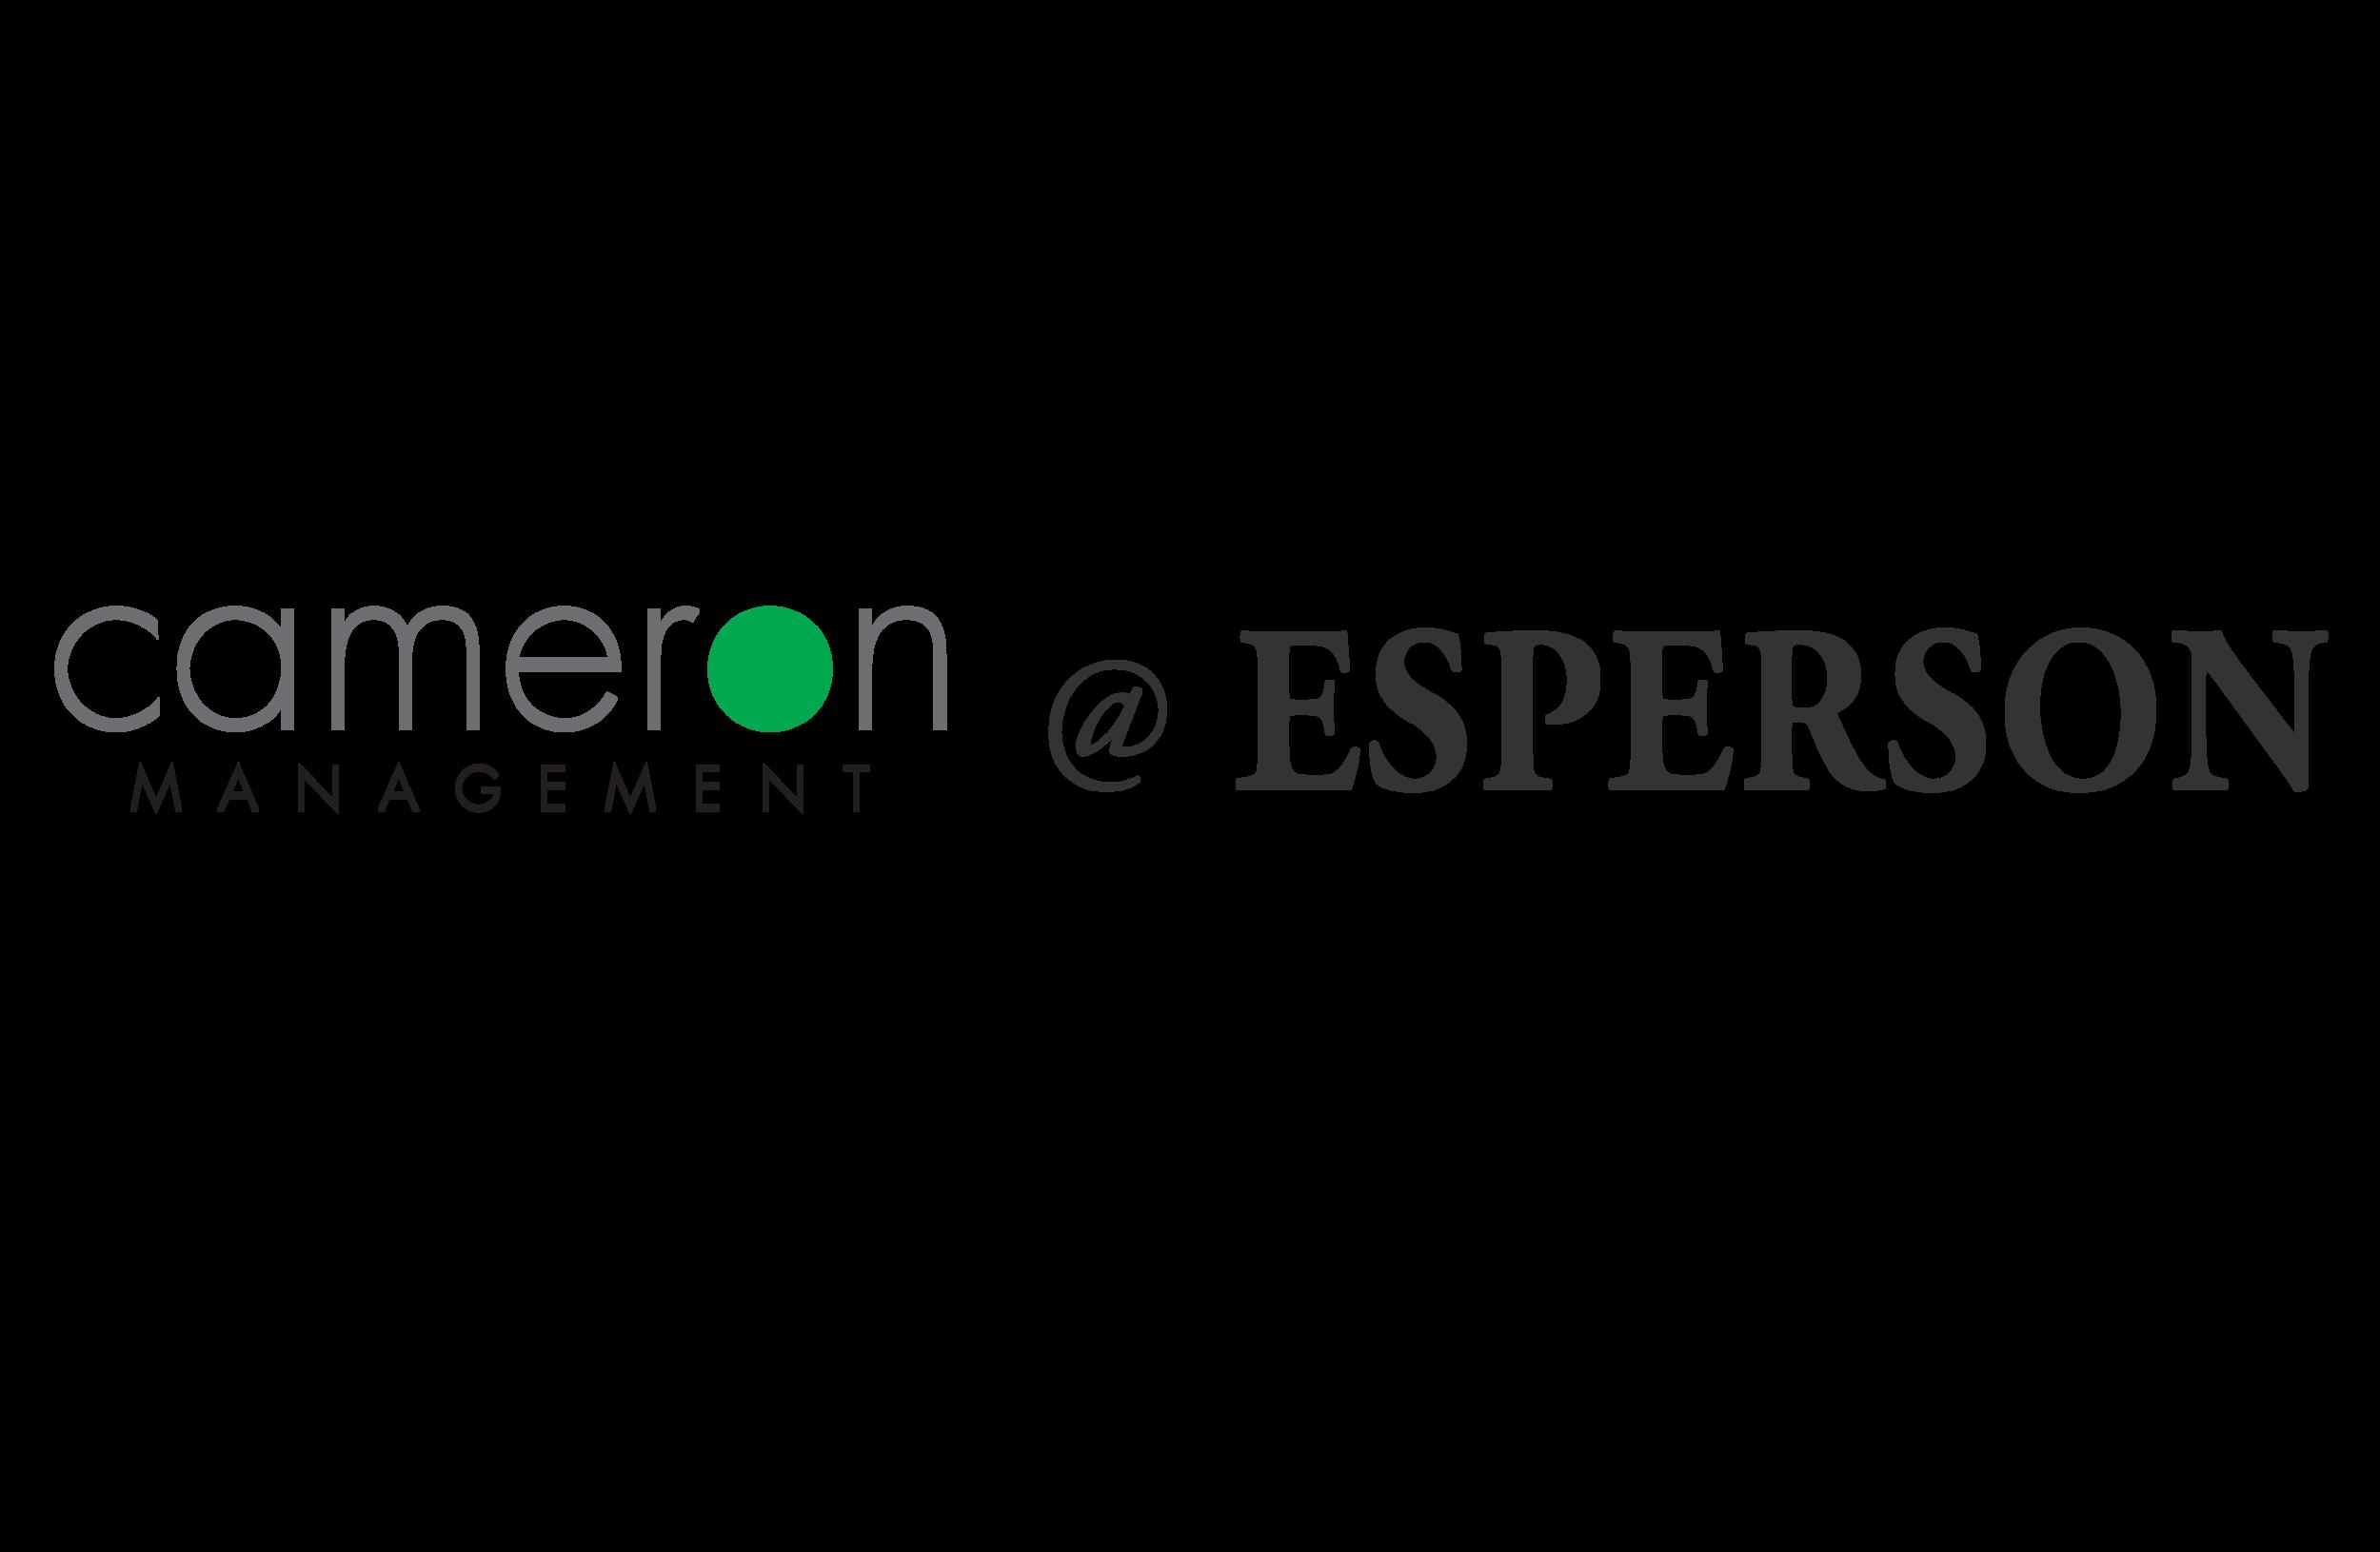 Cameron MGMT @ ESPERSON Horizontal.png